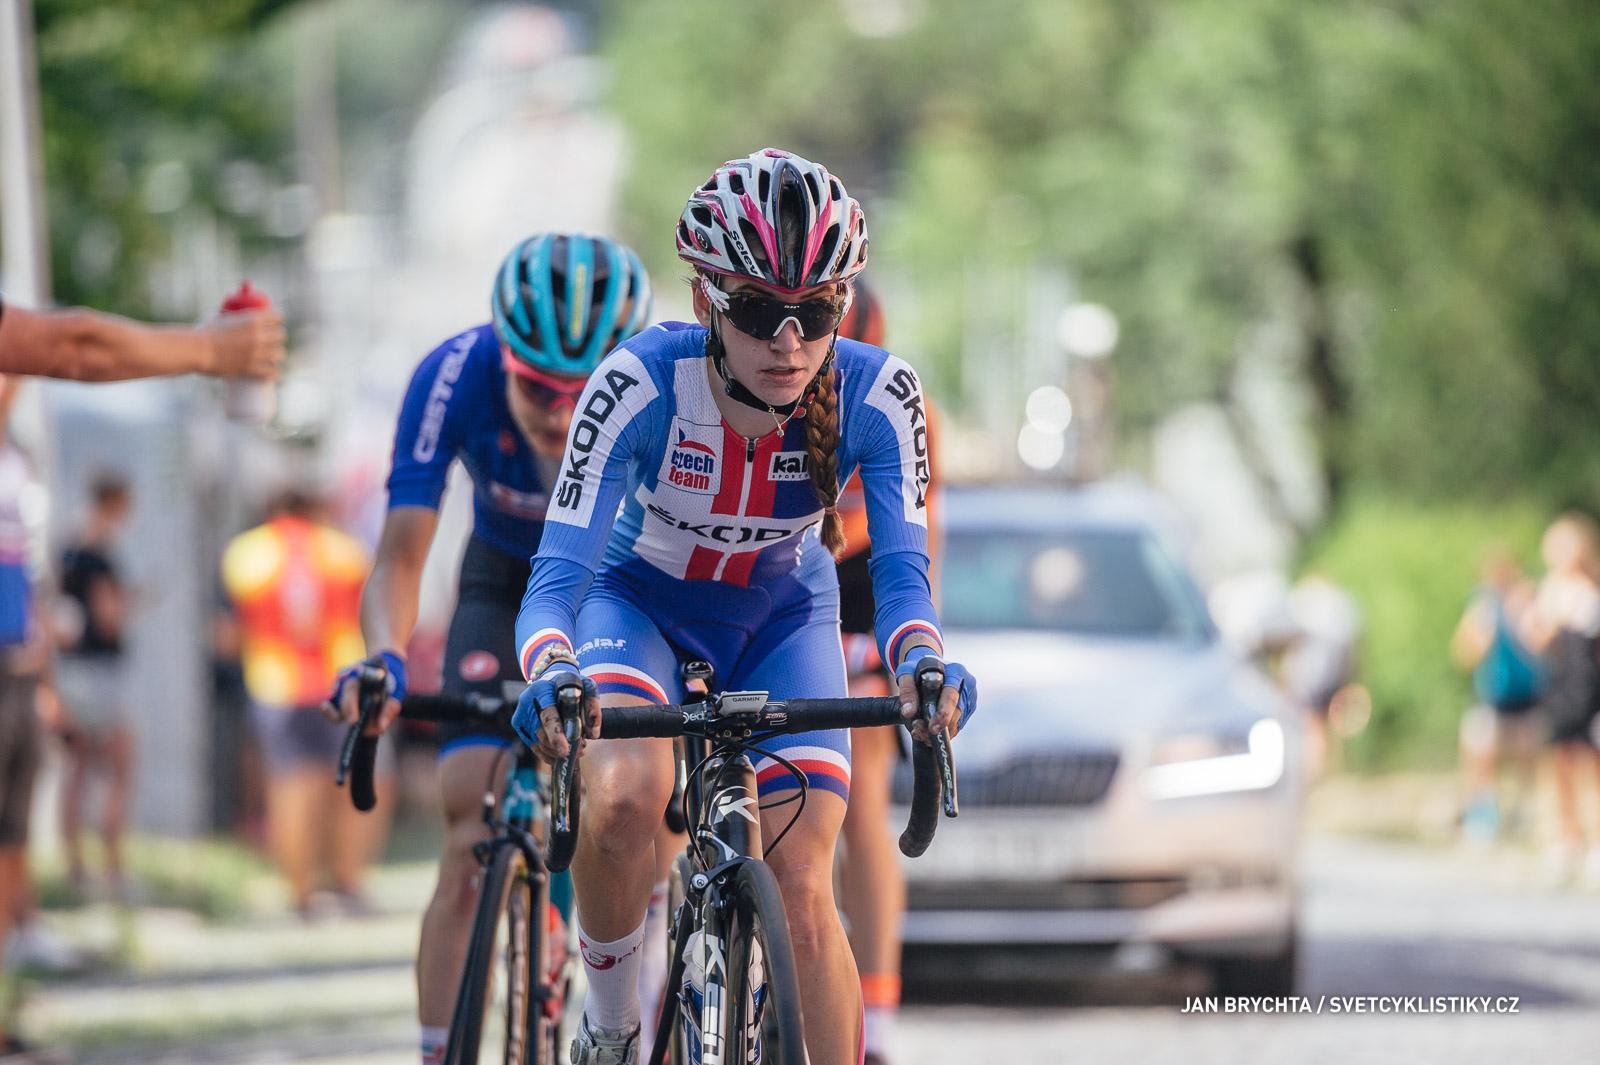 BrychtaJan_European_Championships_EC_Evropa_Zlin_20180714_153308_DSC_1758